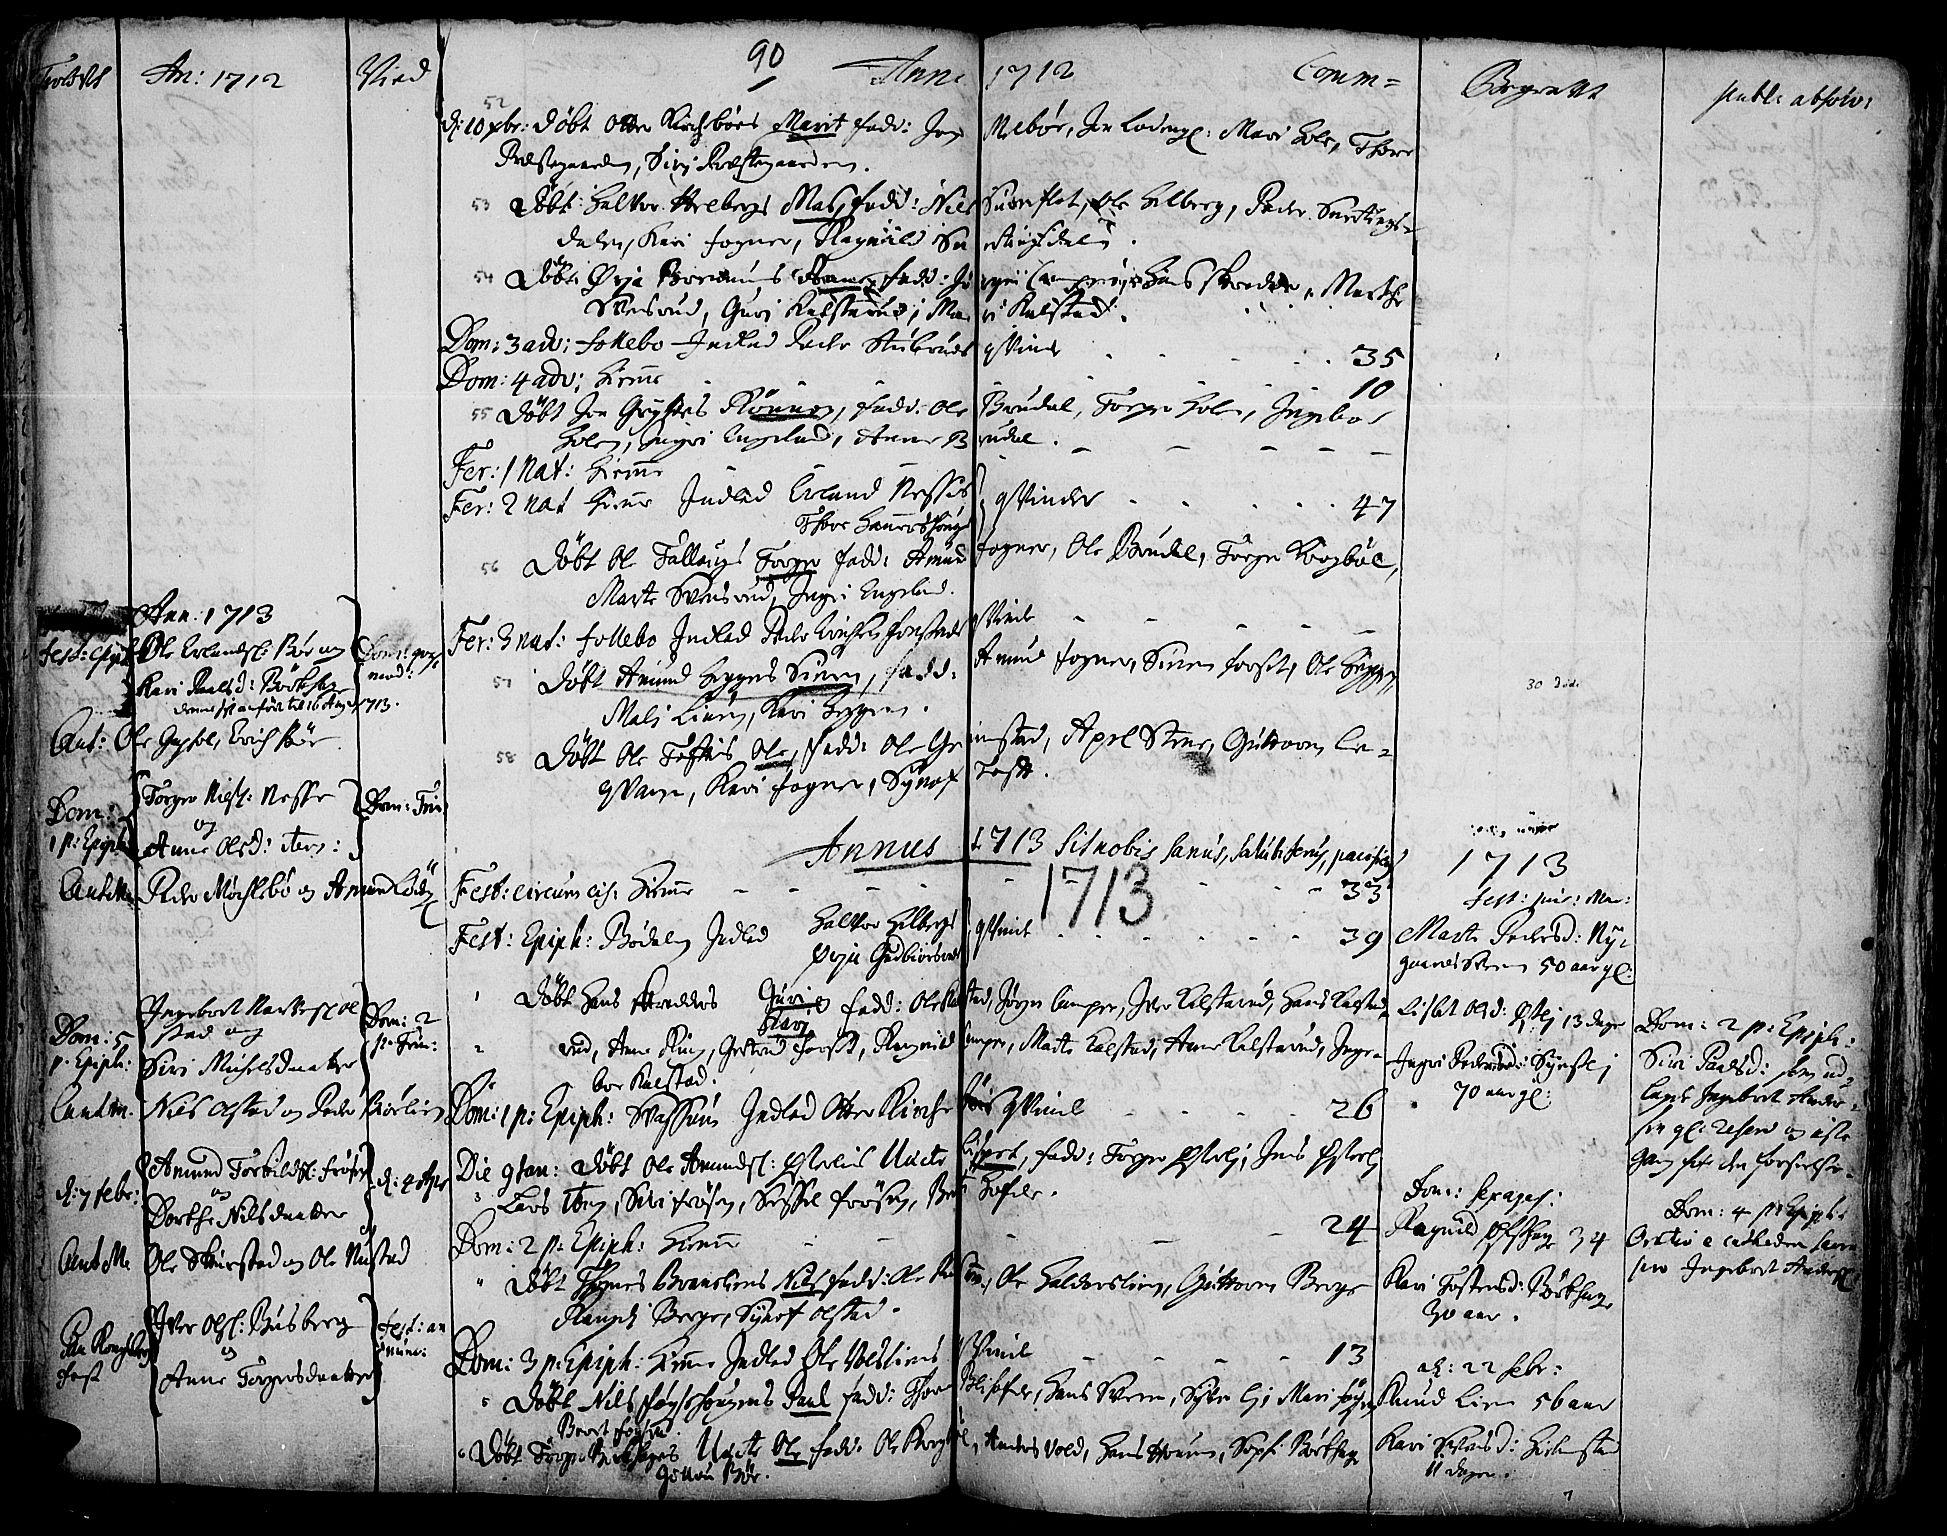 SAH, Gausdal prestekontor, Ministerialbok nr. 1, 1693-1728, s. 90